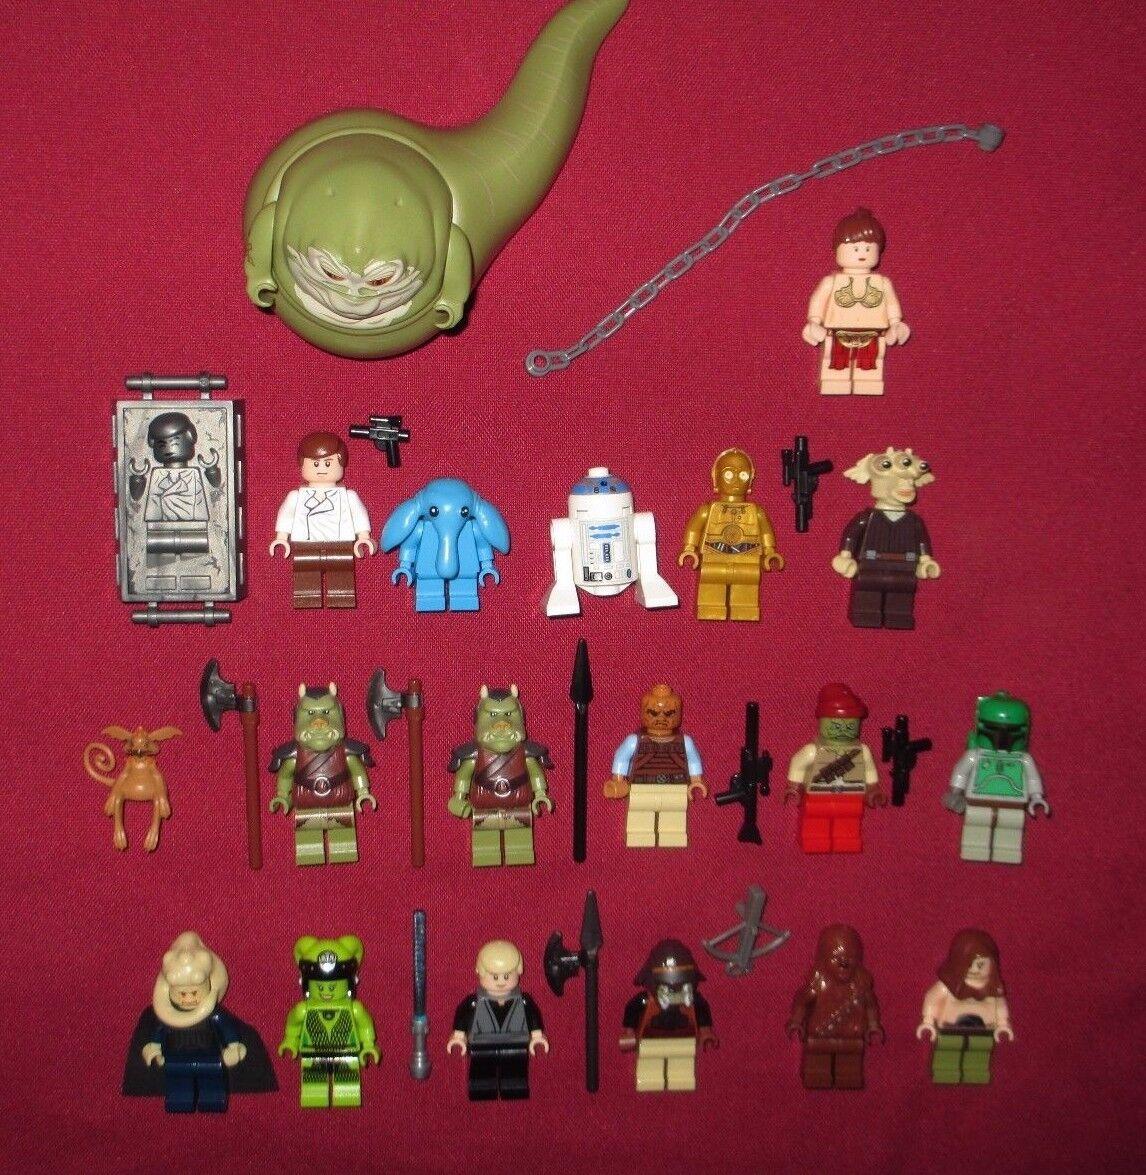 LEGO LEGO LEGO Star Wars minifigure LOT Jabba,Leia,Boba,Lando,Bib,C-3PO,Kithaba,Max Rebo + 9bd3ed